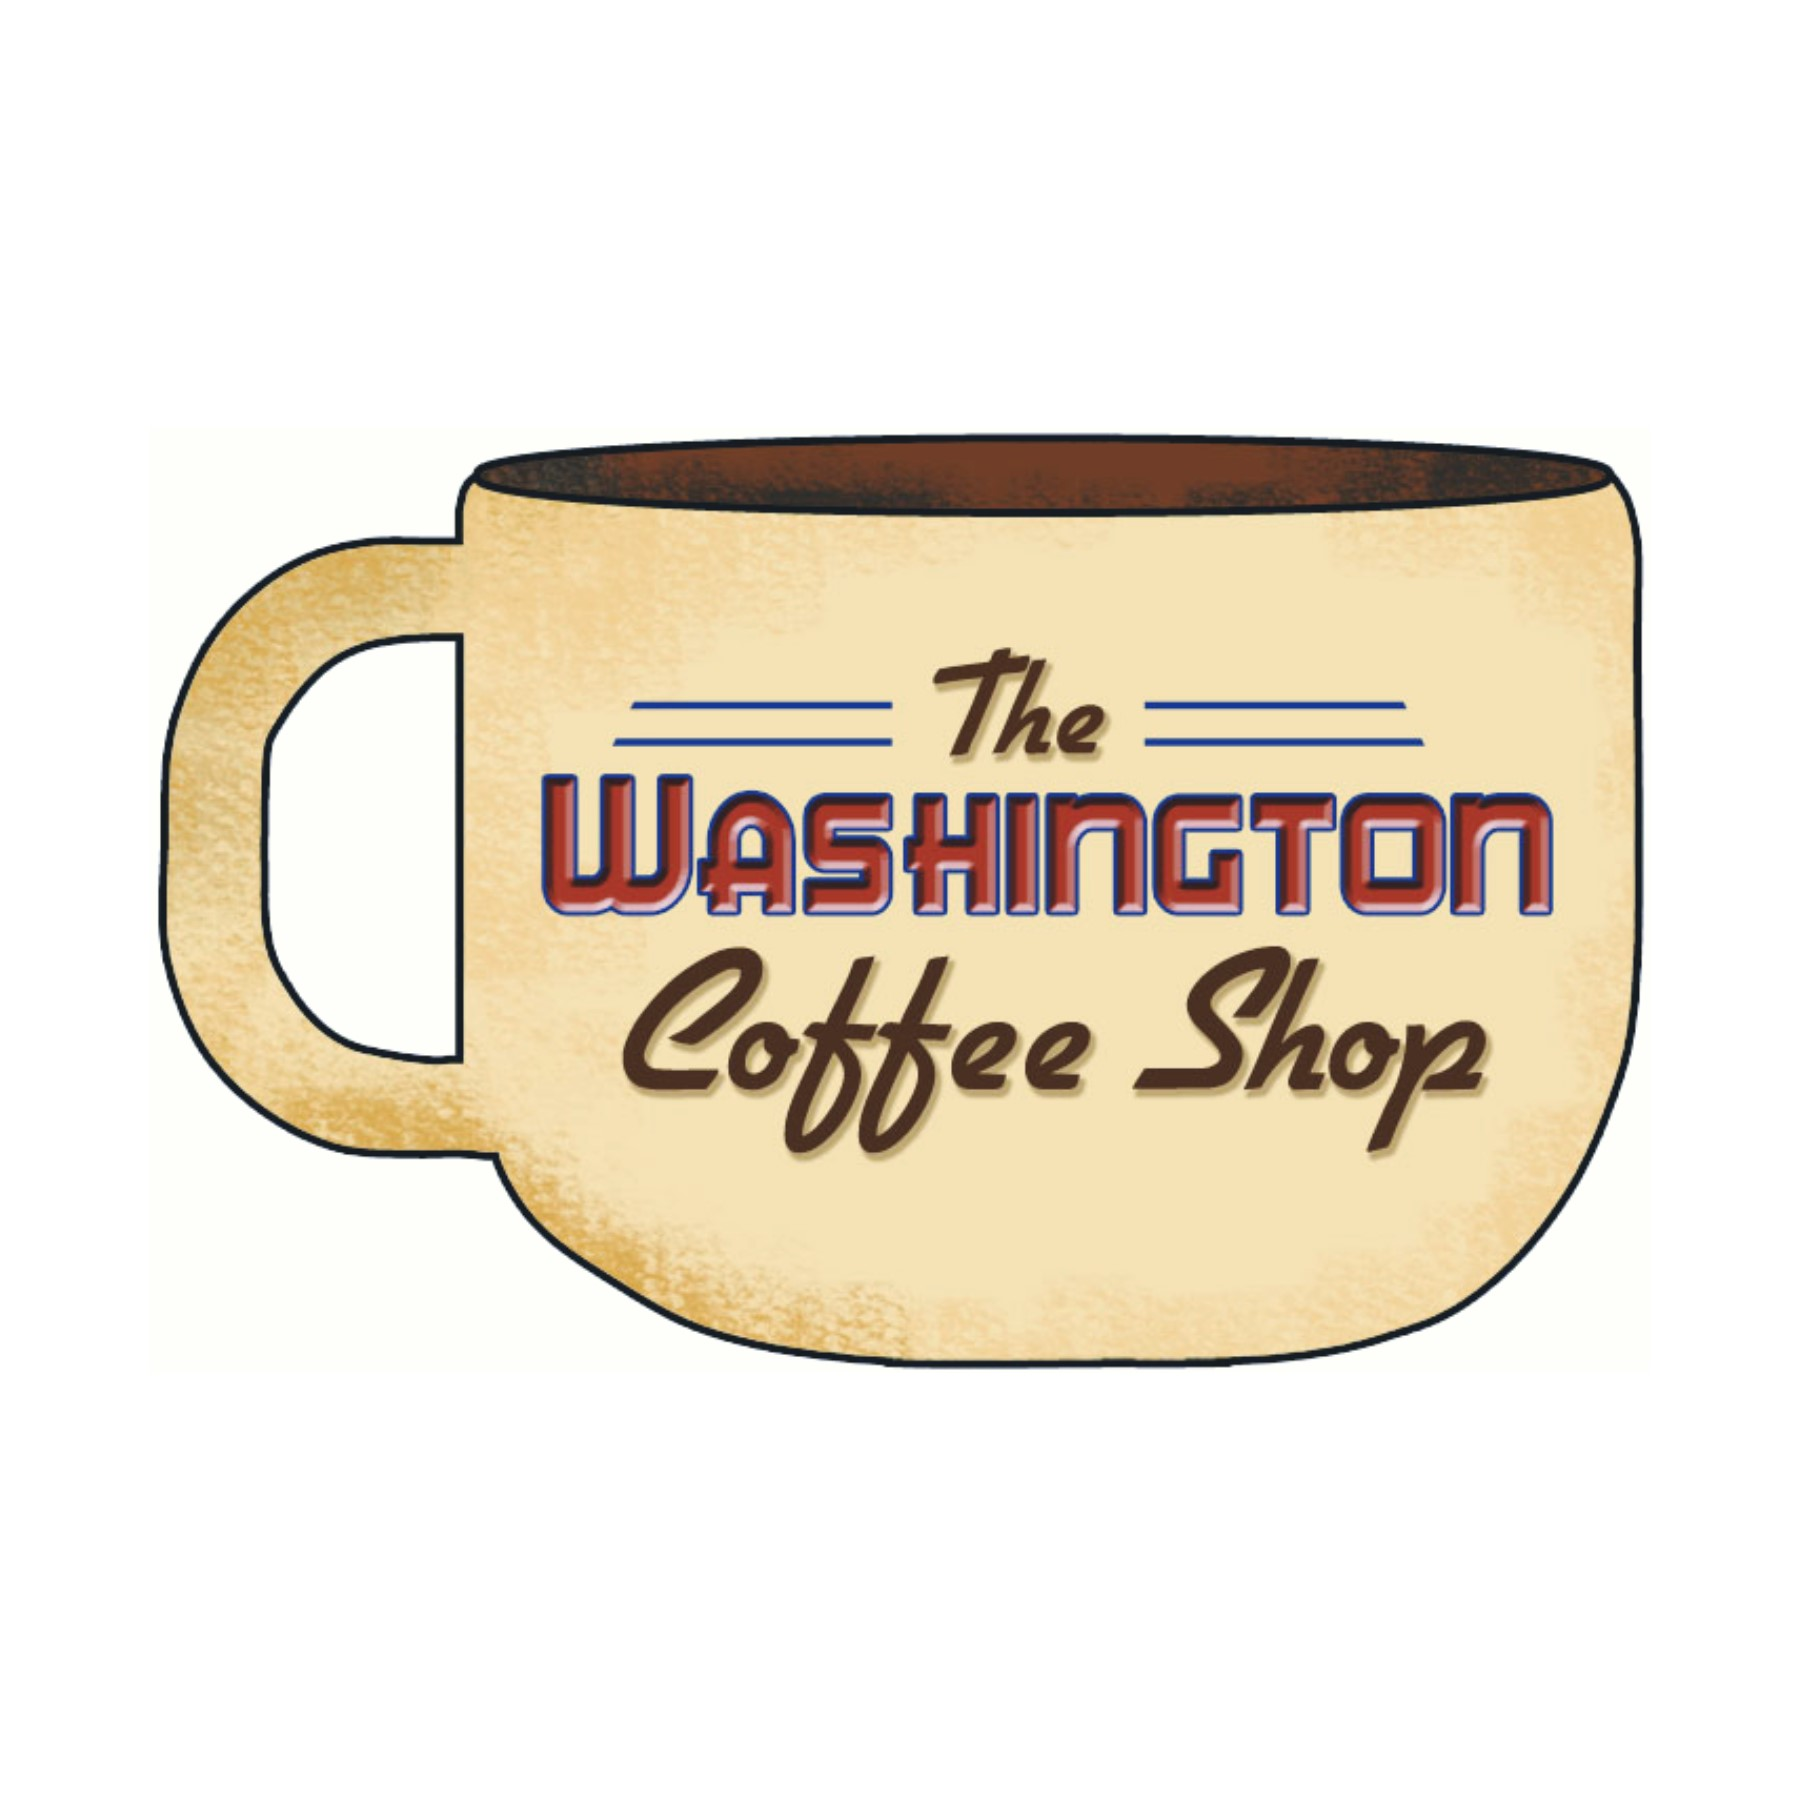 Washington Coffee Shop.jpg